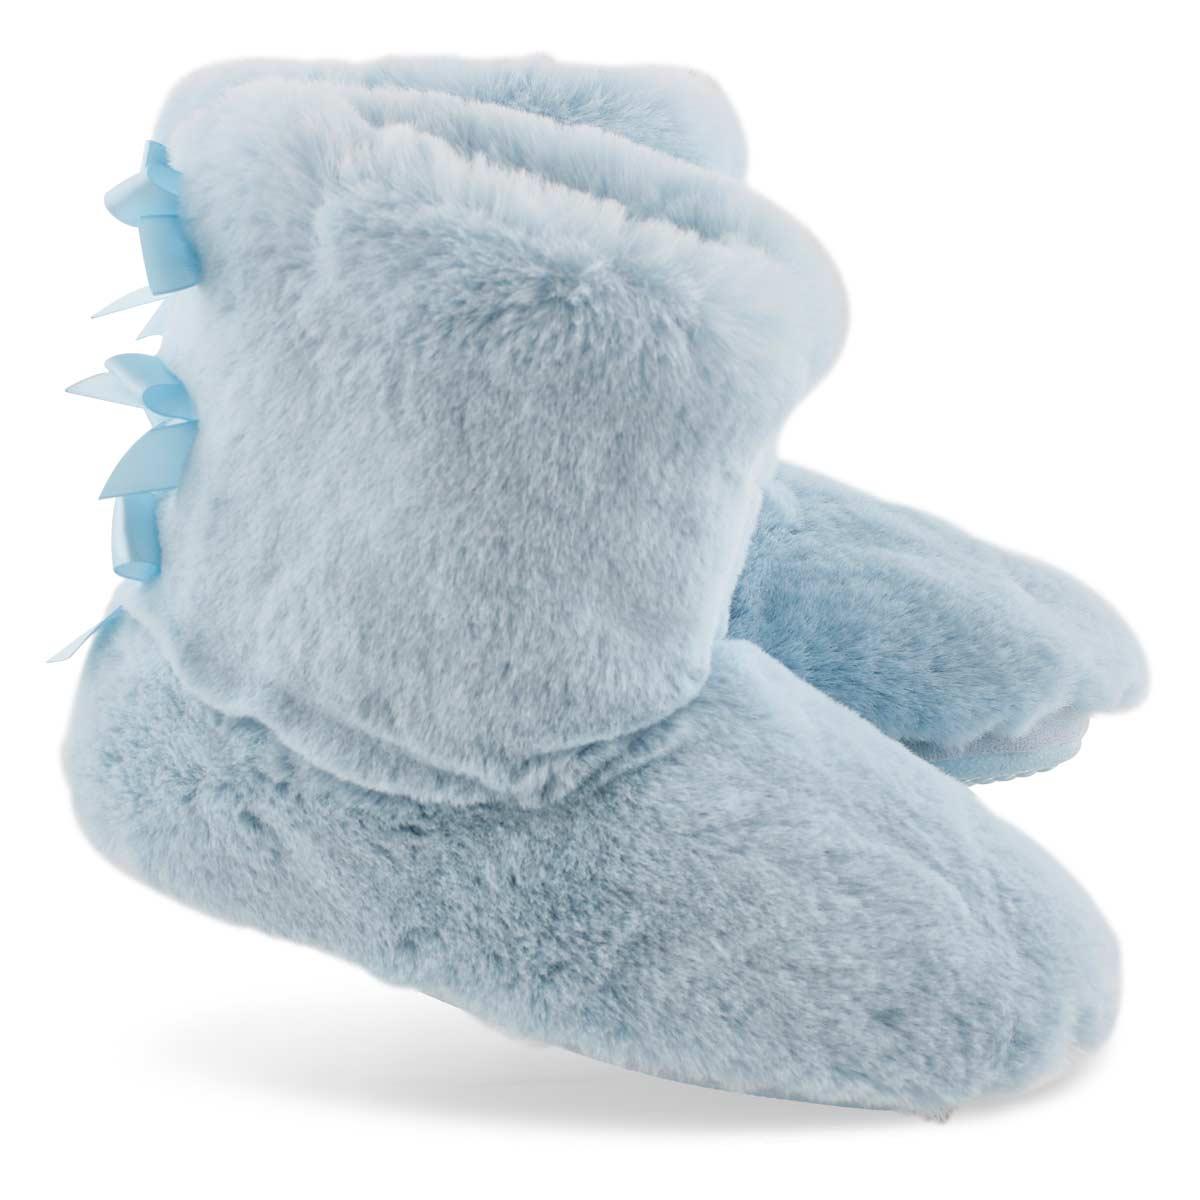 Botte-pantoufle Zippy2.0, bleu ciel, fem